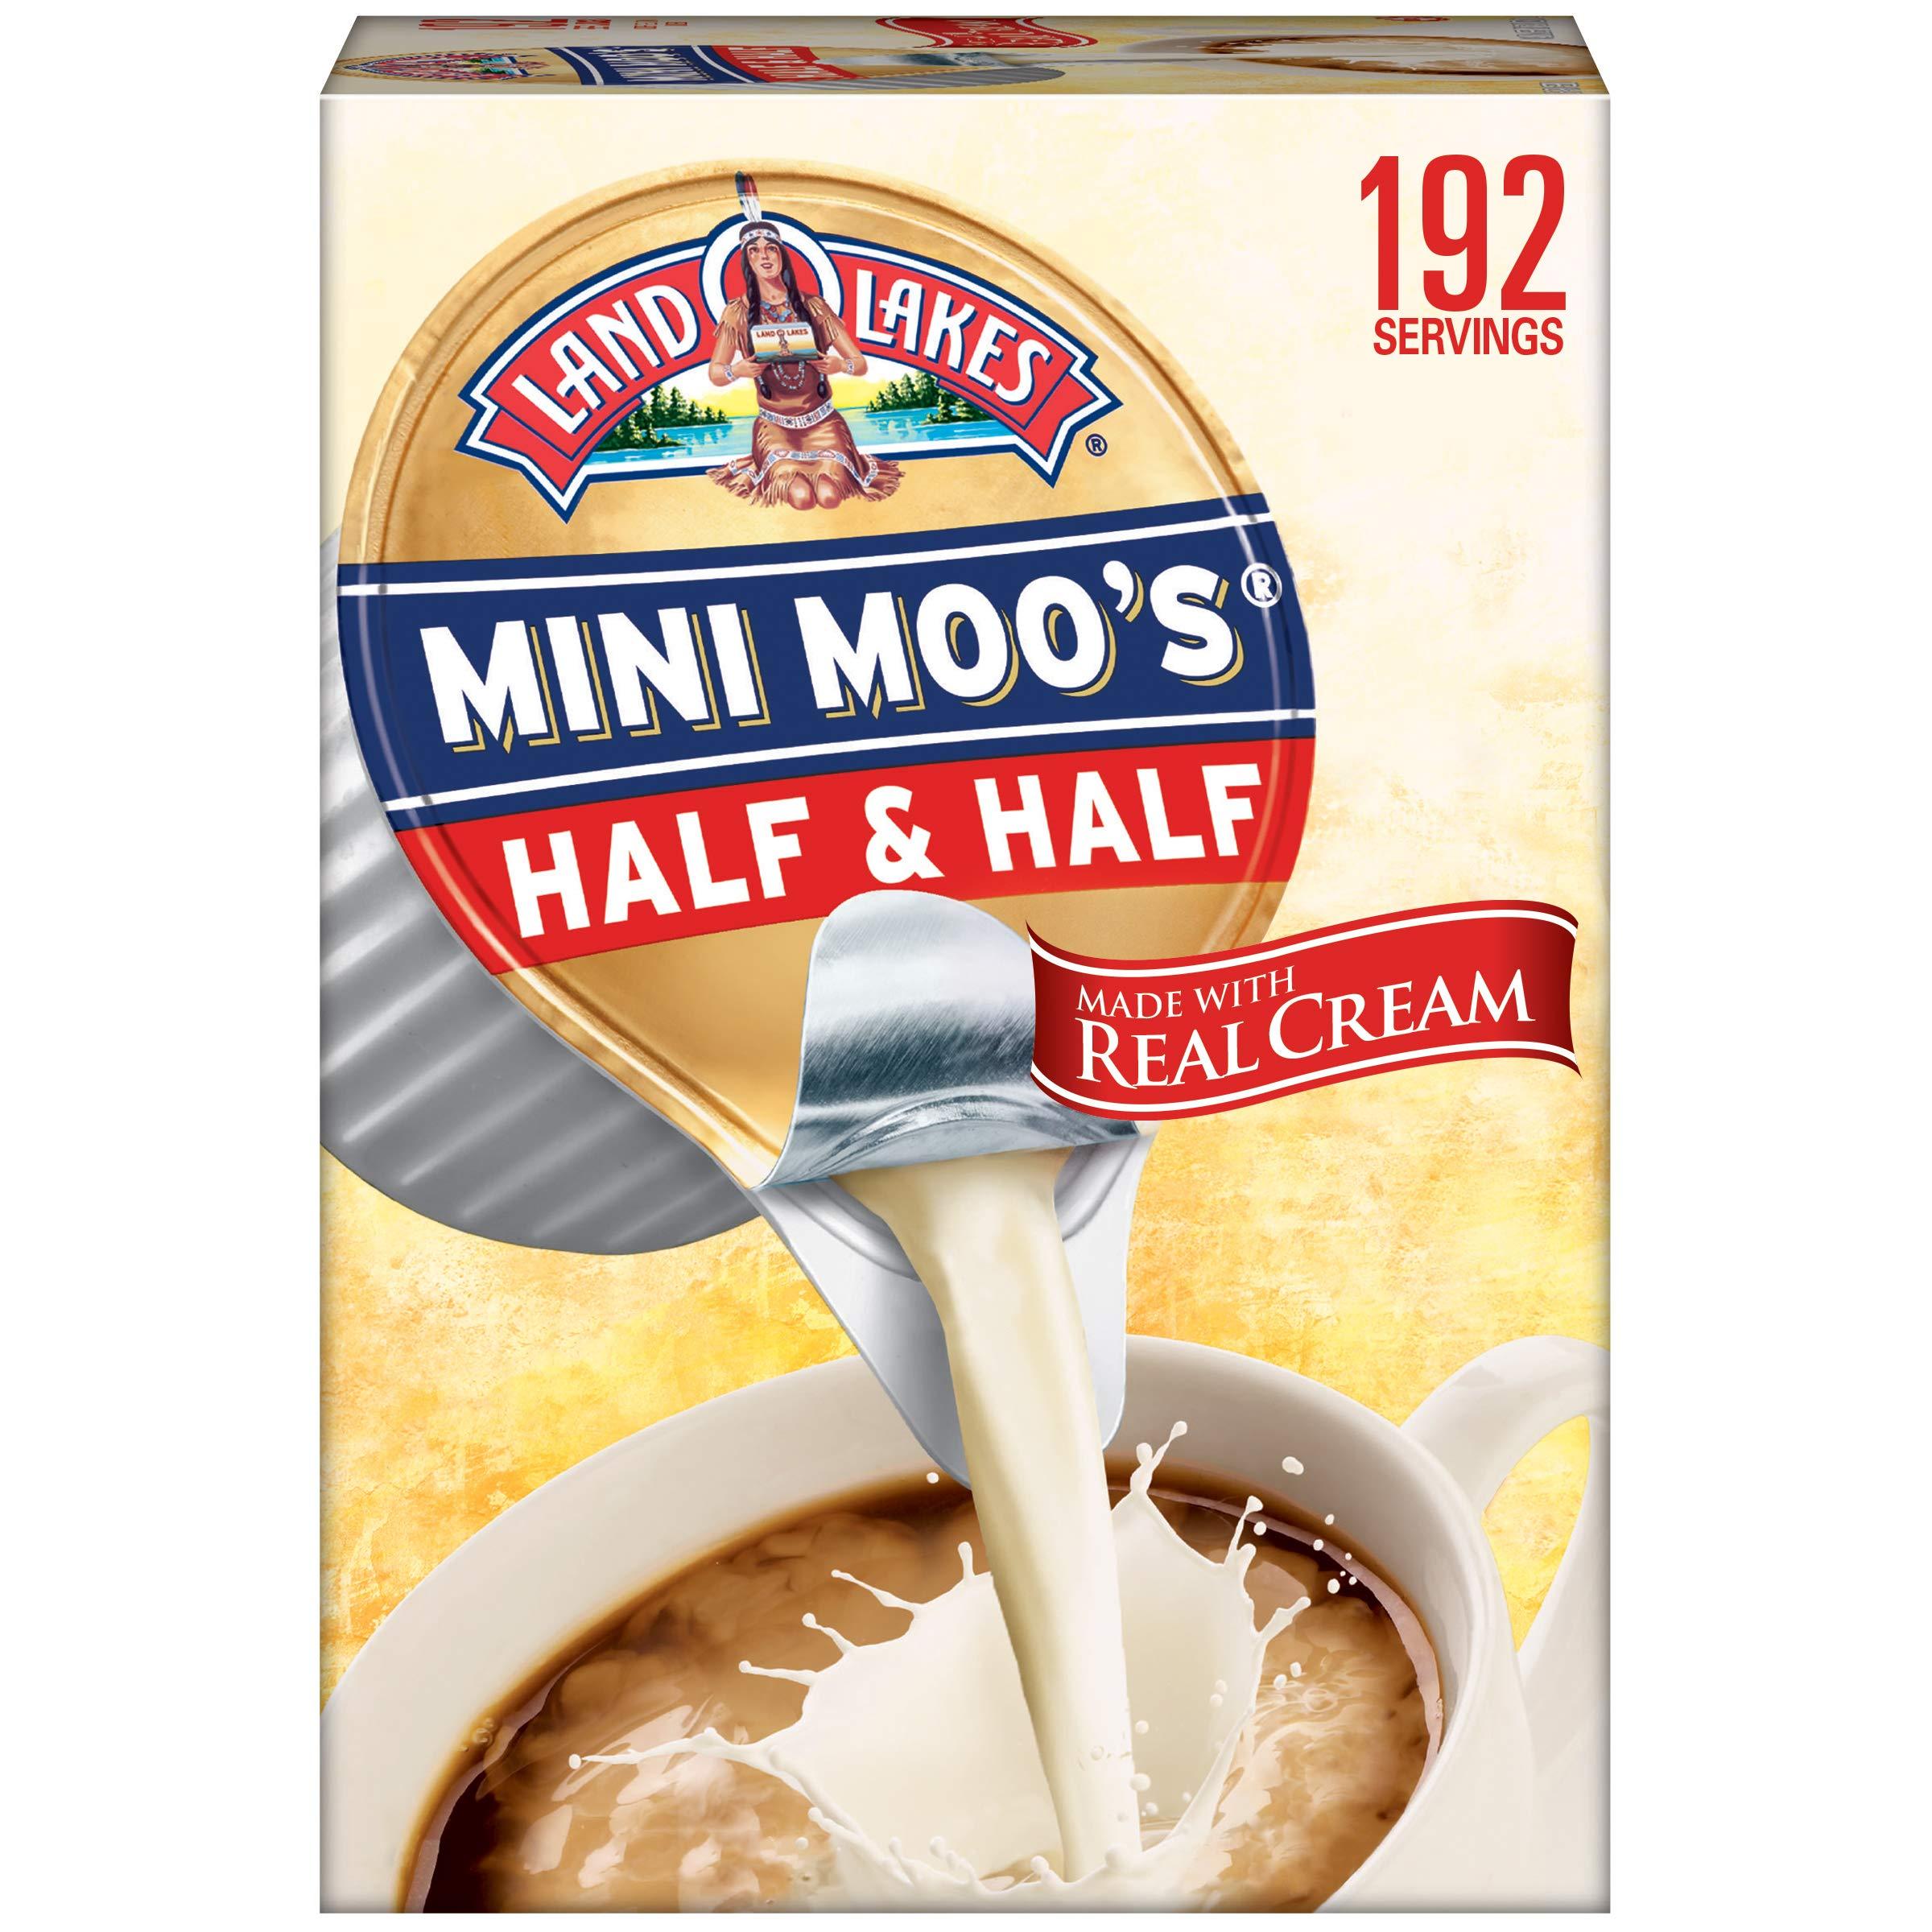 Land O' Lakes Mini-Moo's Half & Half